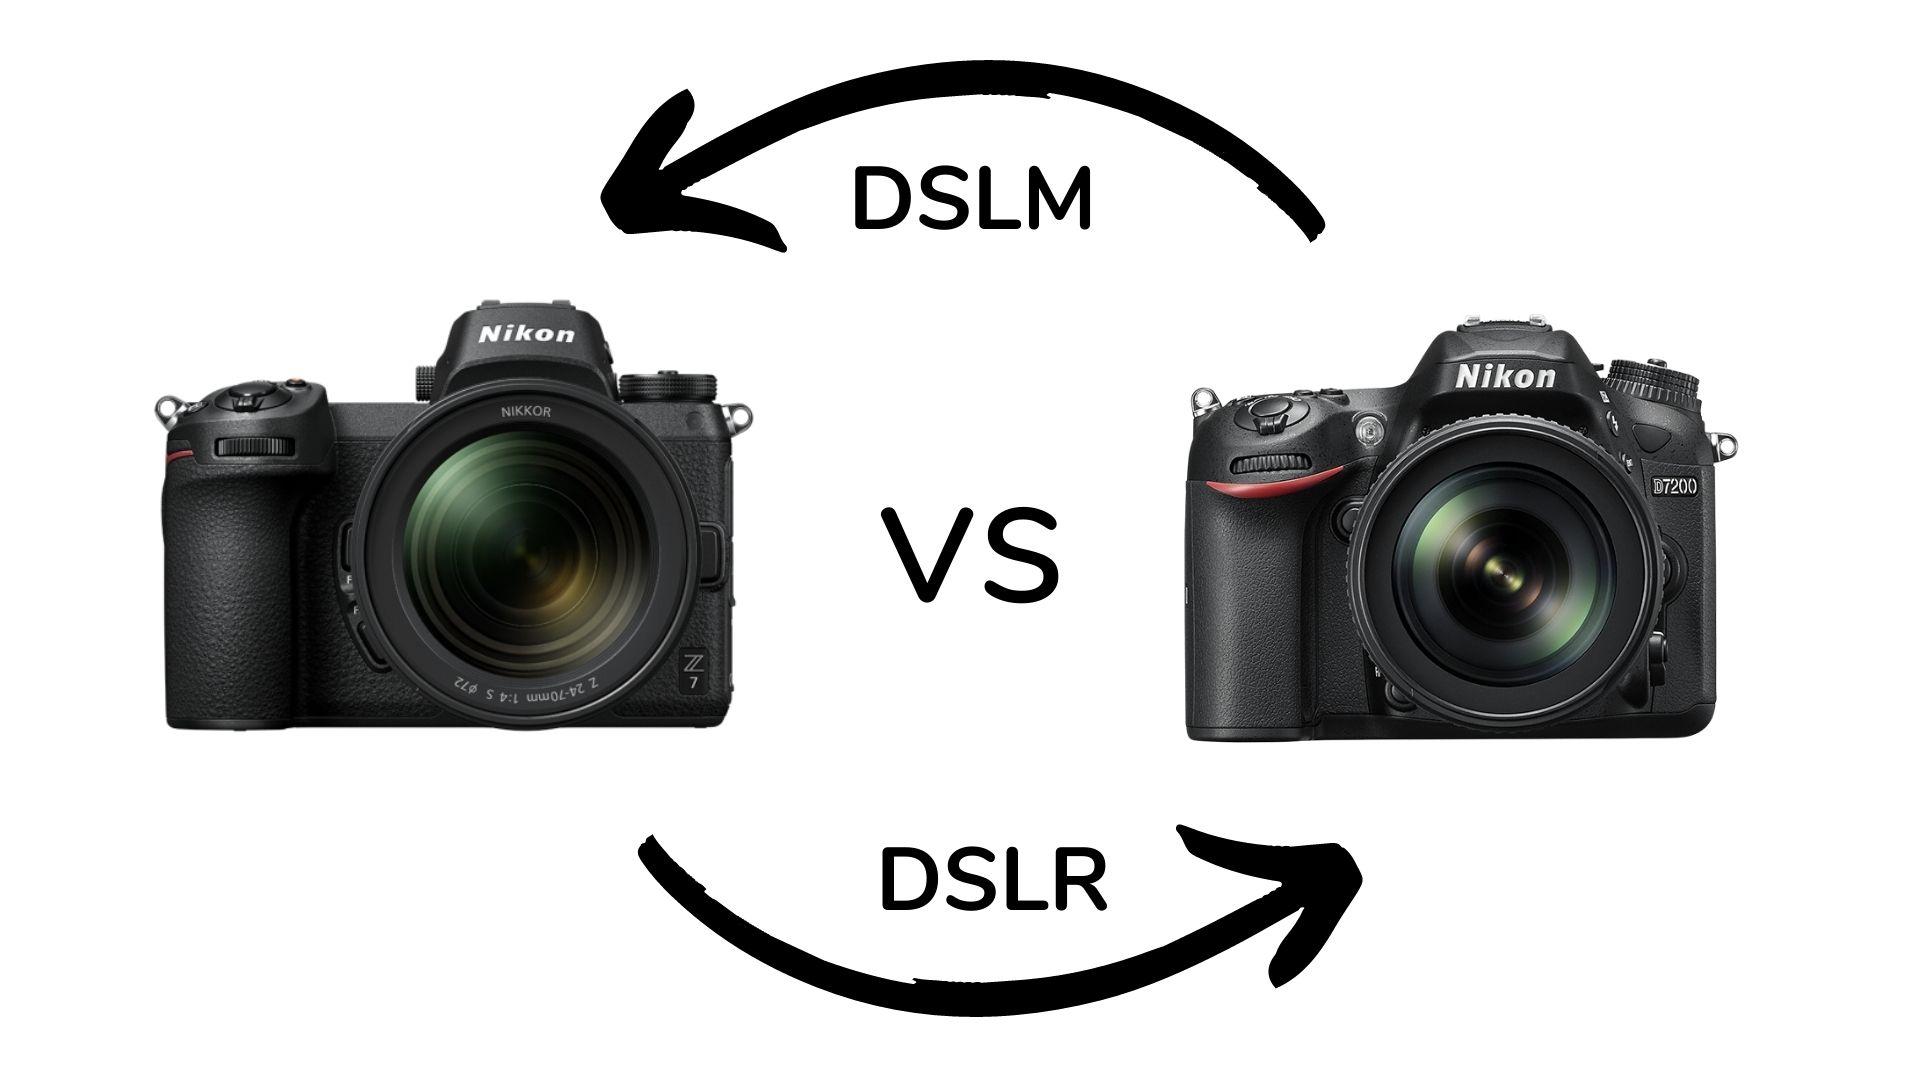 Grafik, DSLR vs DSLM ,Stefan Mohme